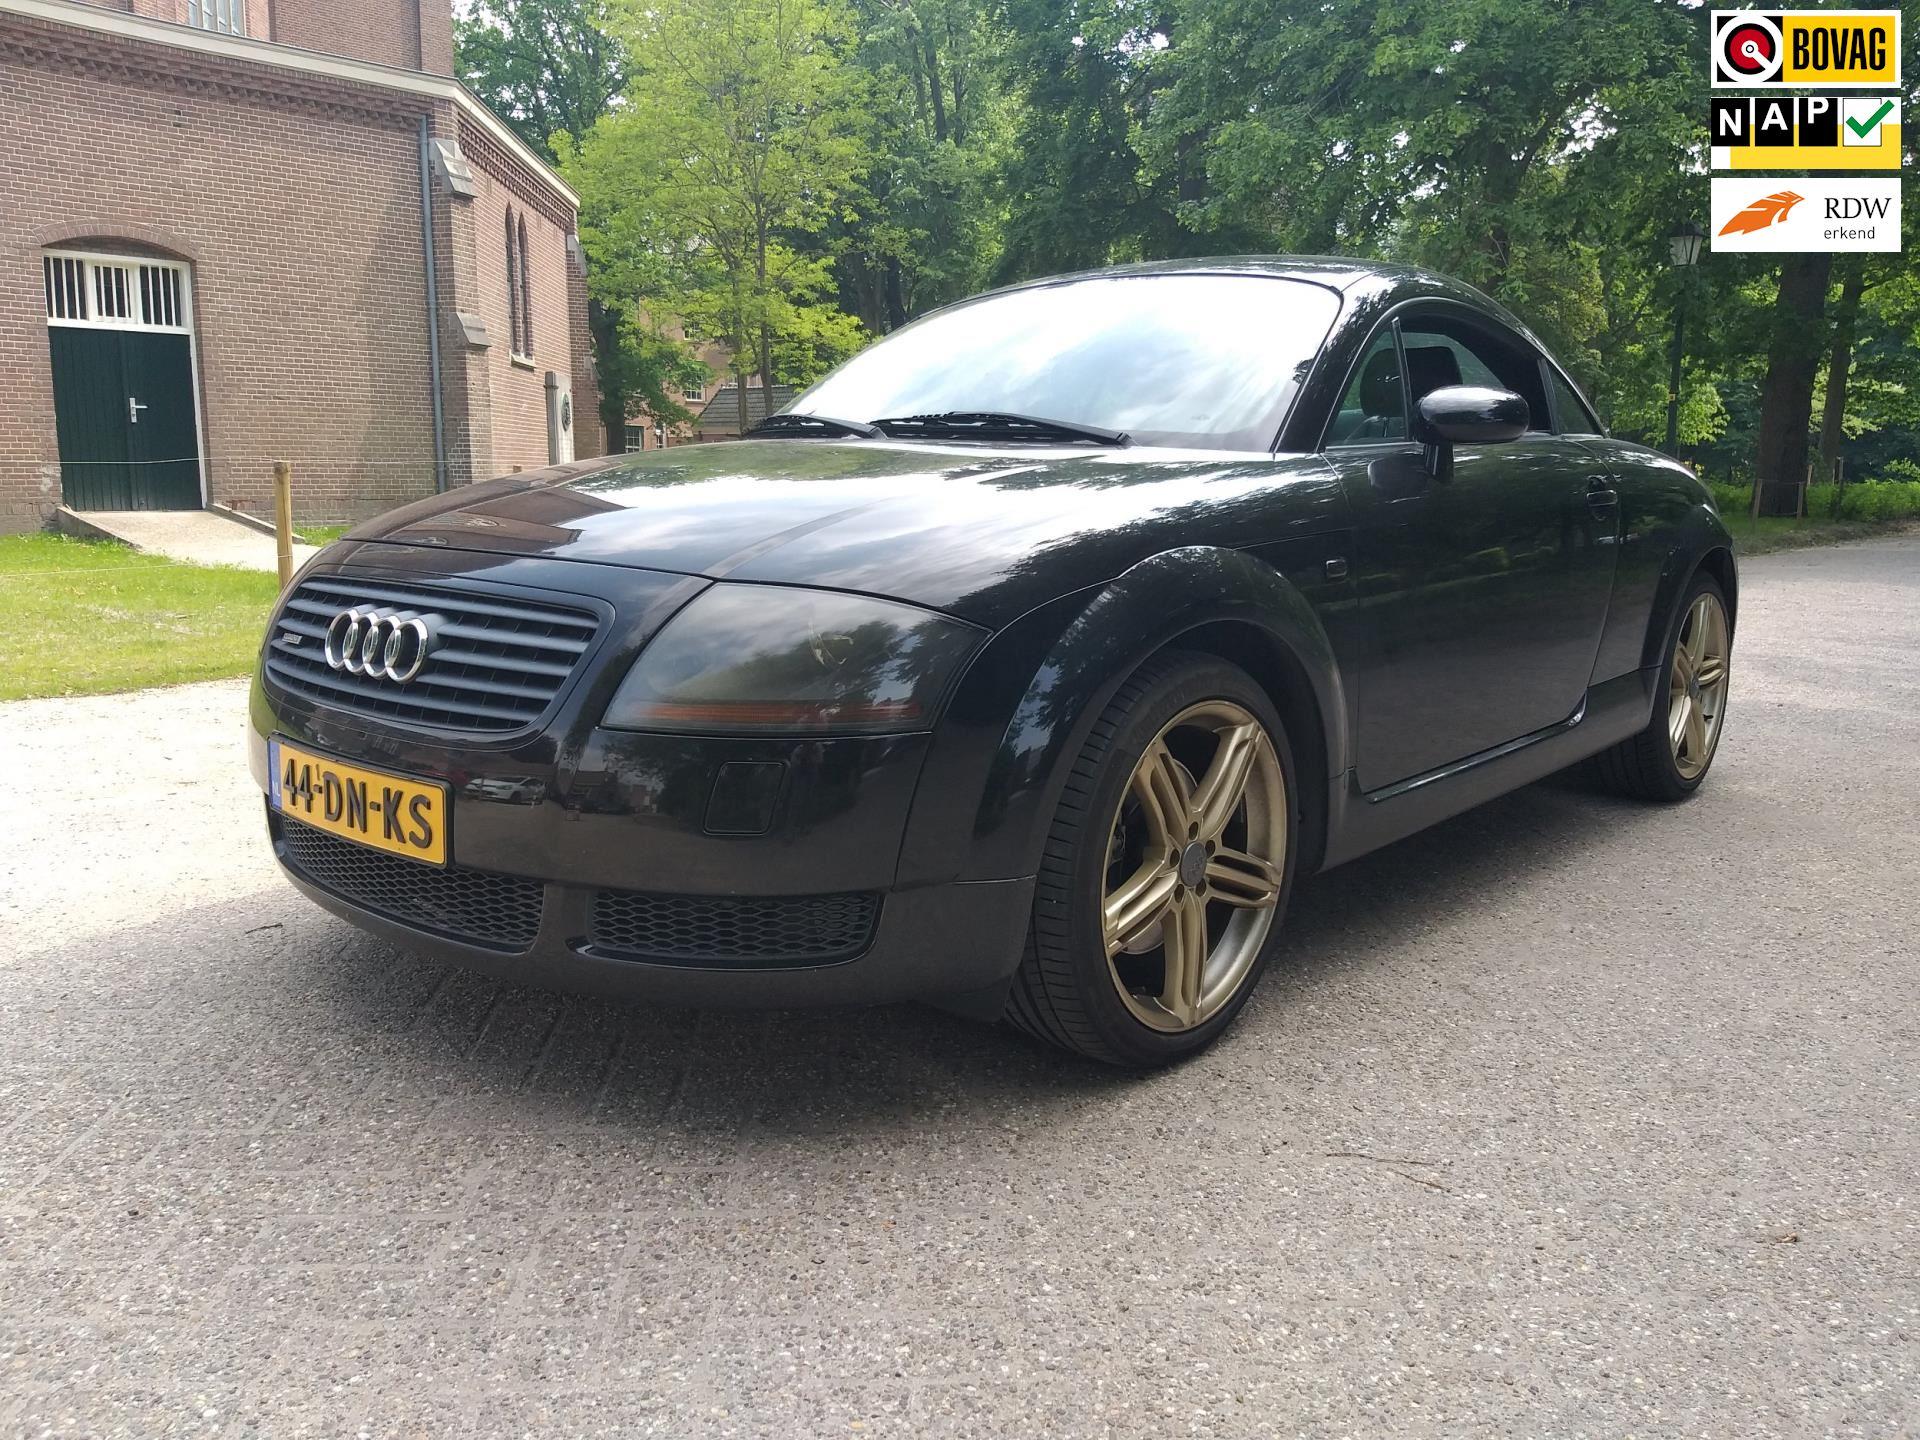 Audi TT occasion - Garage C. Vink